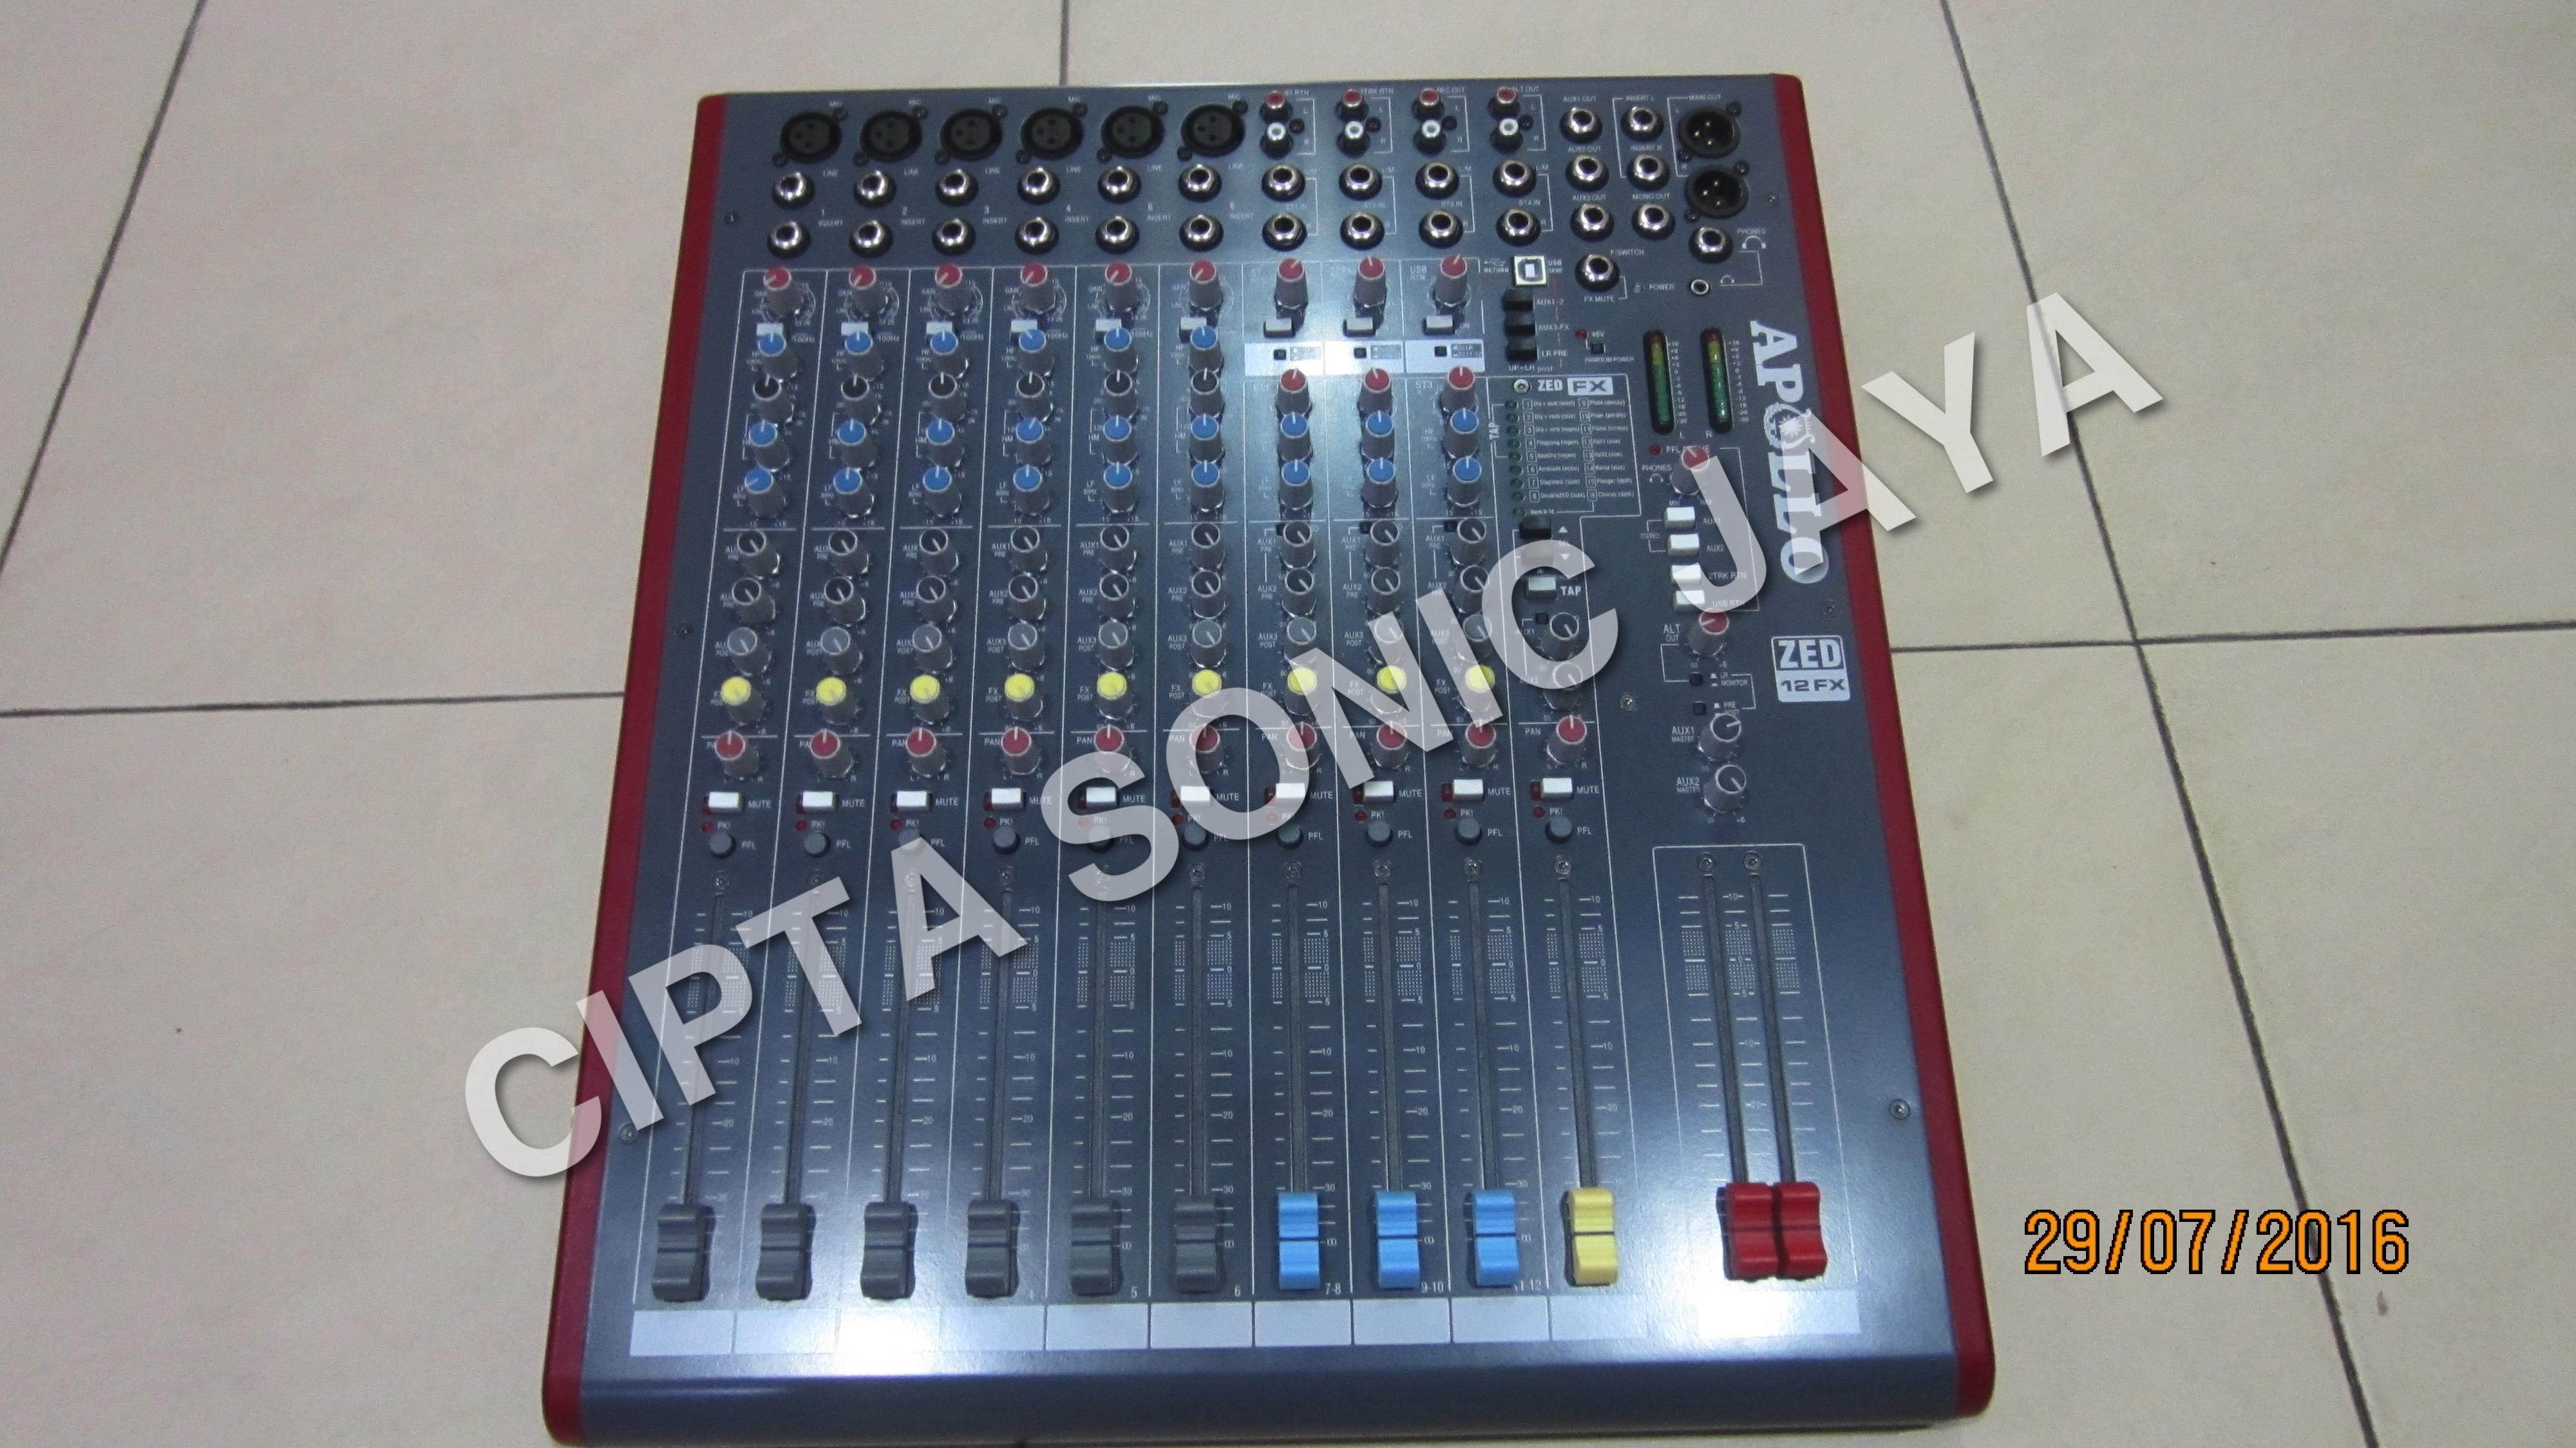 Sell Apollo Audio Mixer from Indonesia by Toko Cipta Sonic Jaya Cheap Price